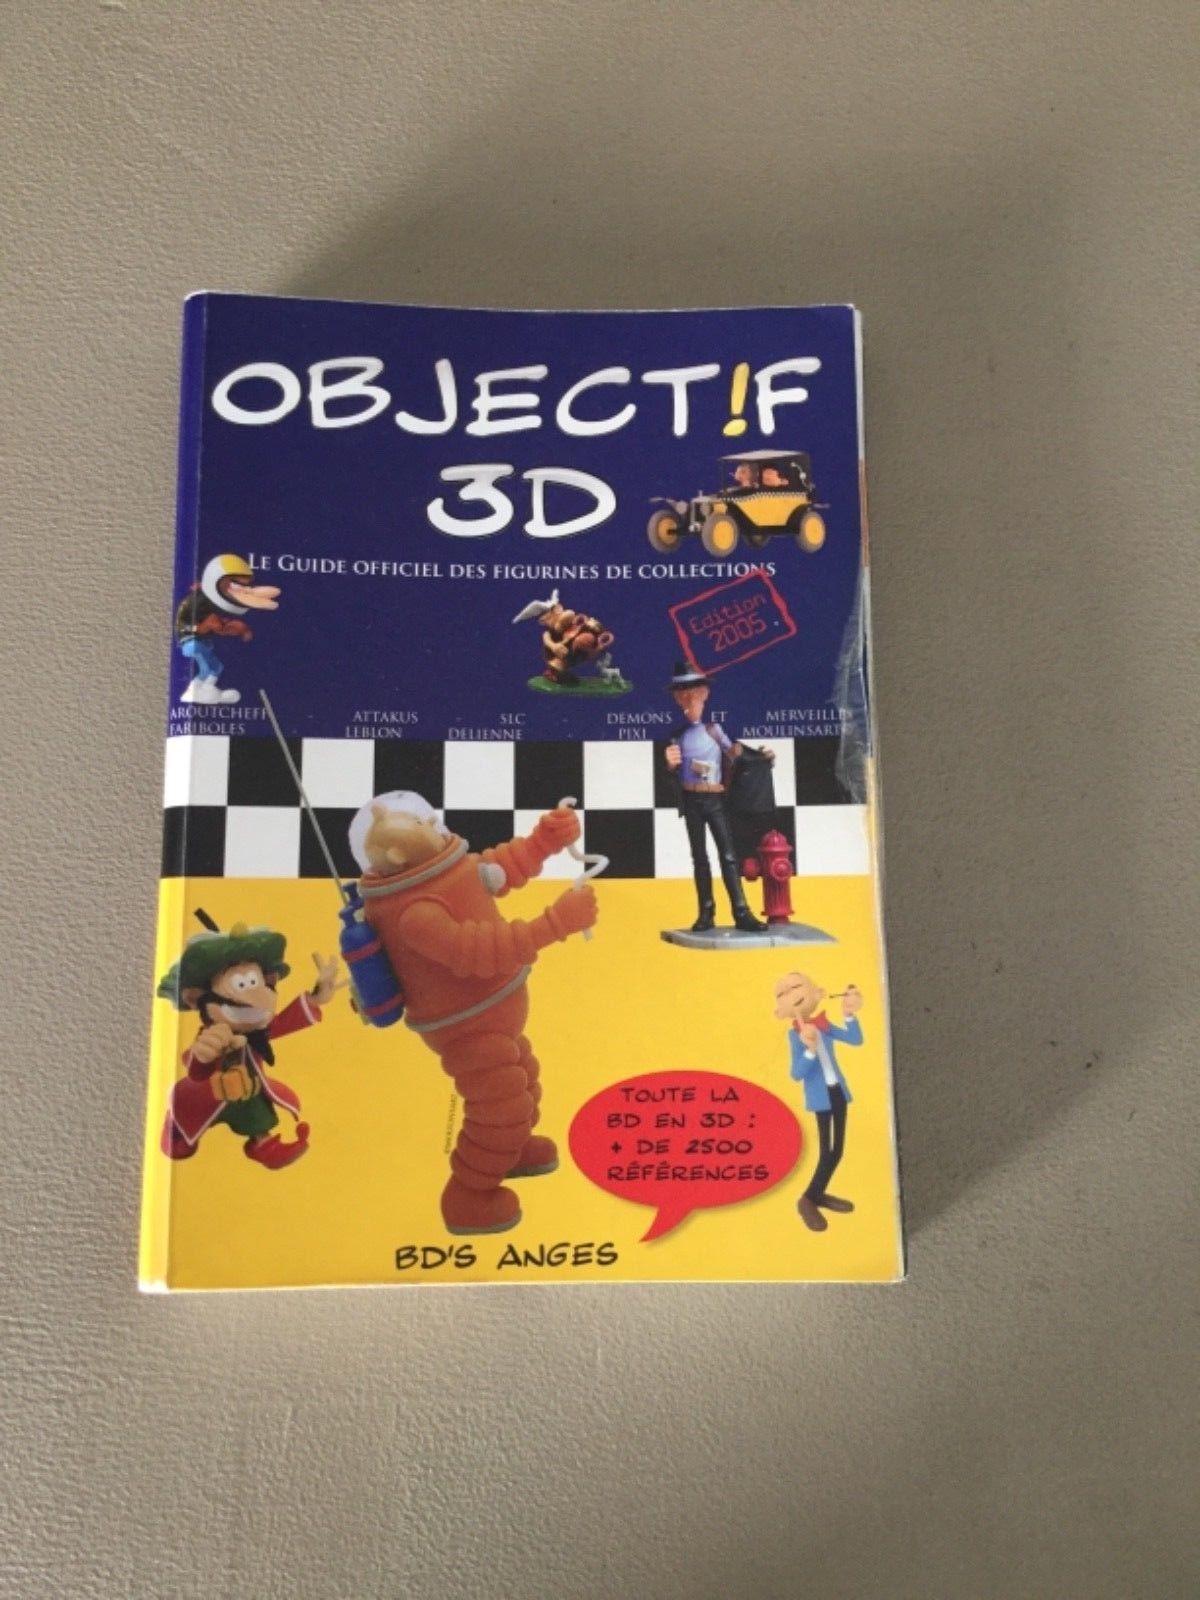 Catalogue Objectif 3D edition 2005 Avec Aroutcheff TinTin Fariboles Attakus ect.